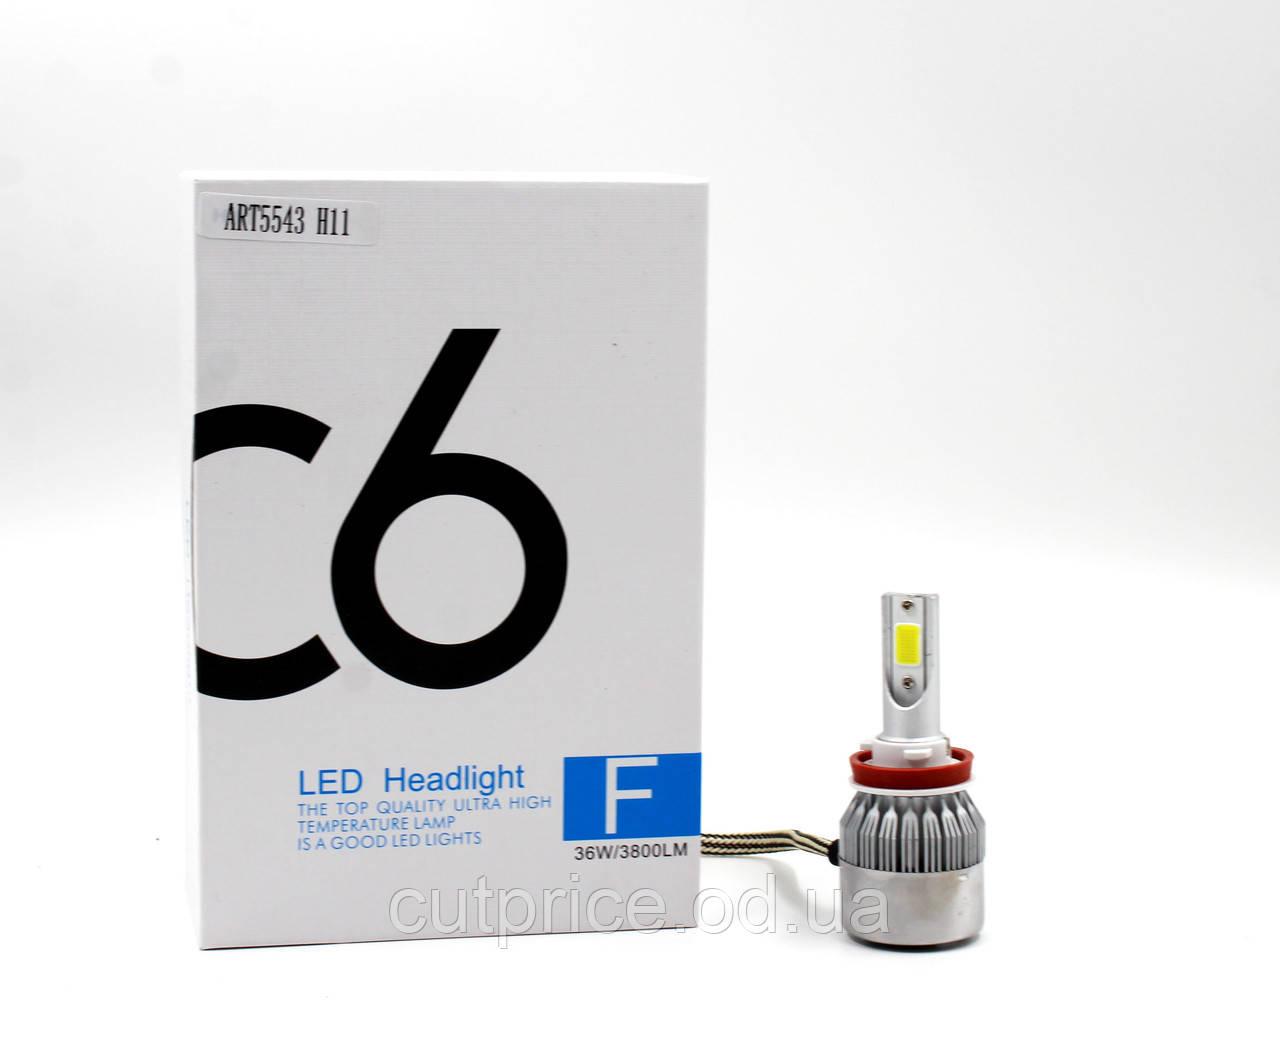 Комплект LED ламп C6 H11 (50)в уп. 50шт.